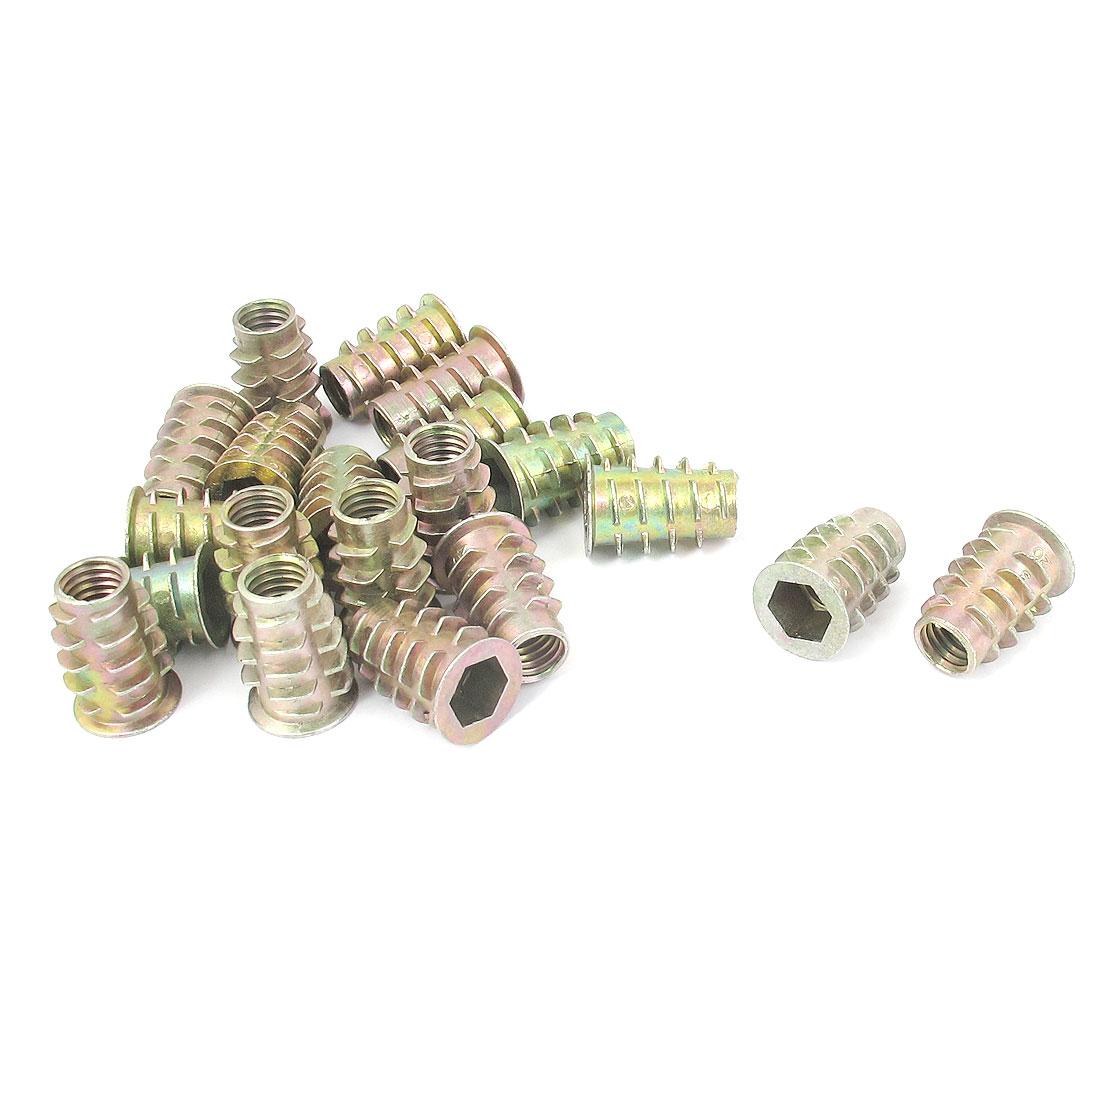 20 Pcs M8x20mm Zinc Plated Hex Socket Screw in Thread Insert Nut for Wood